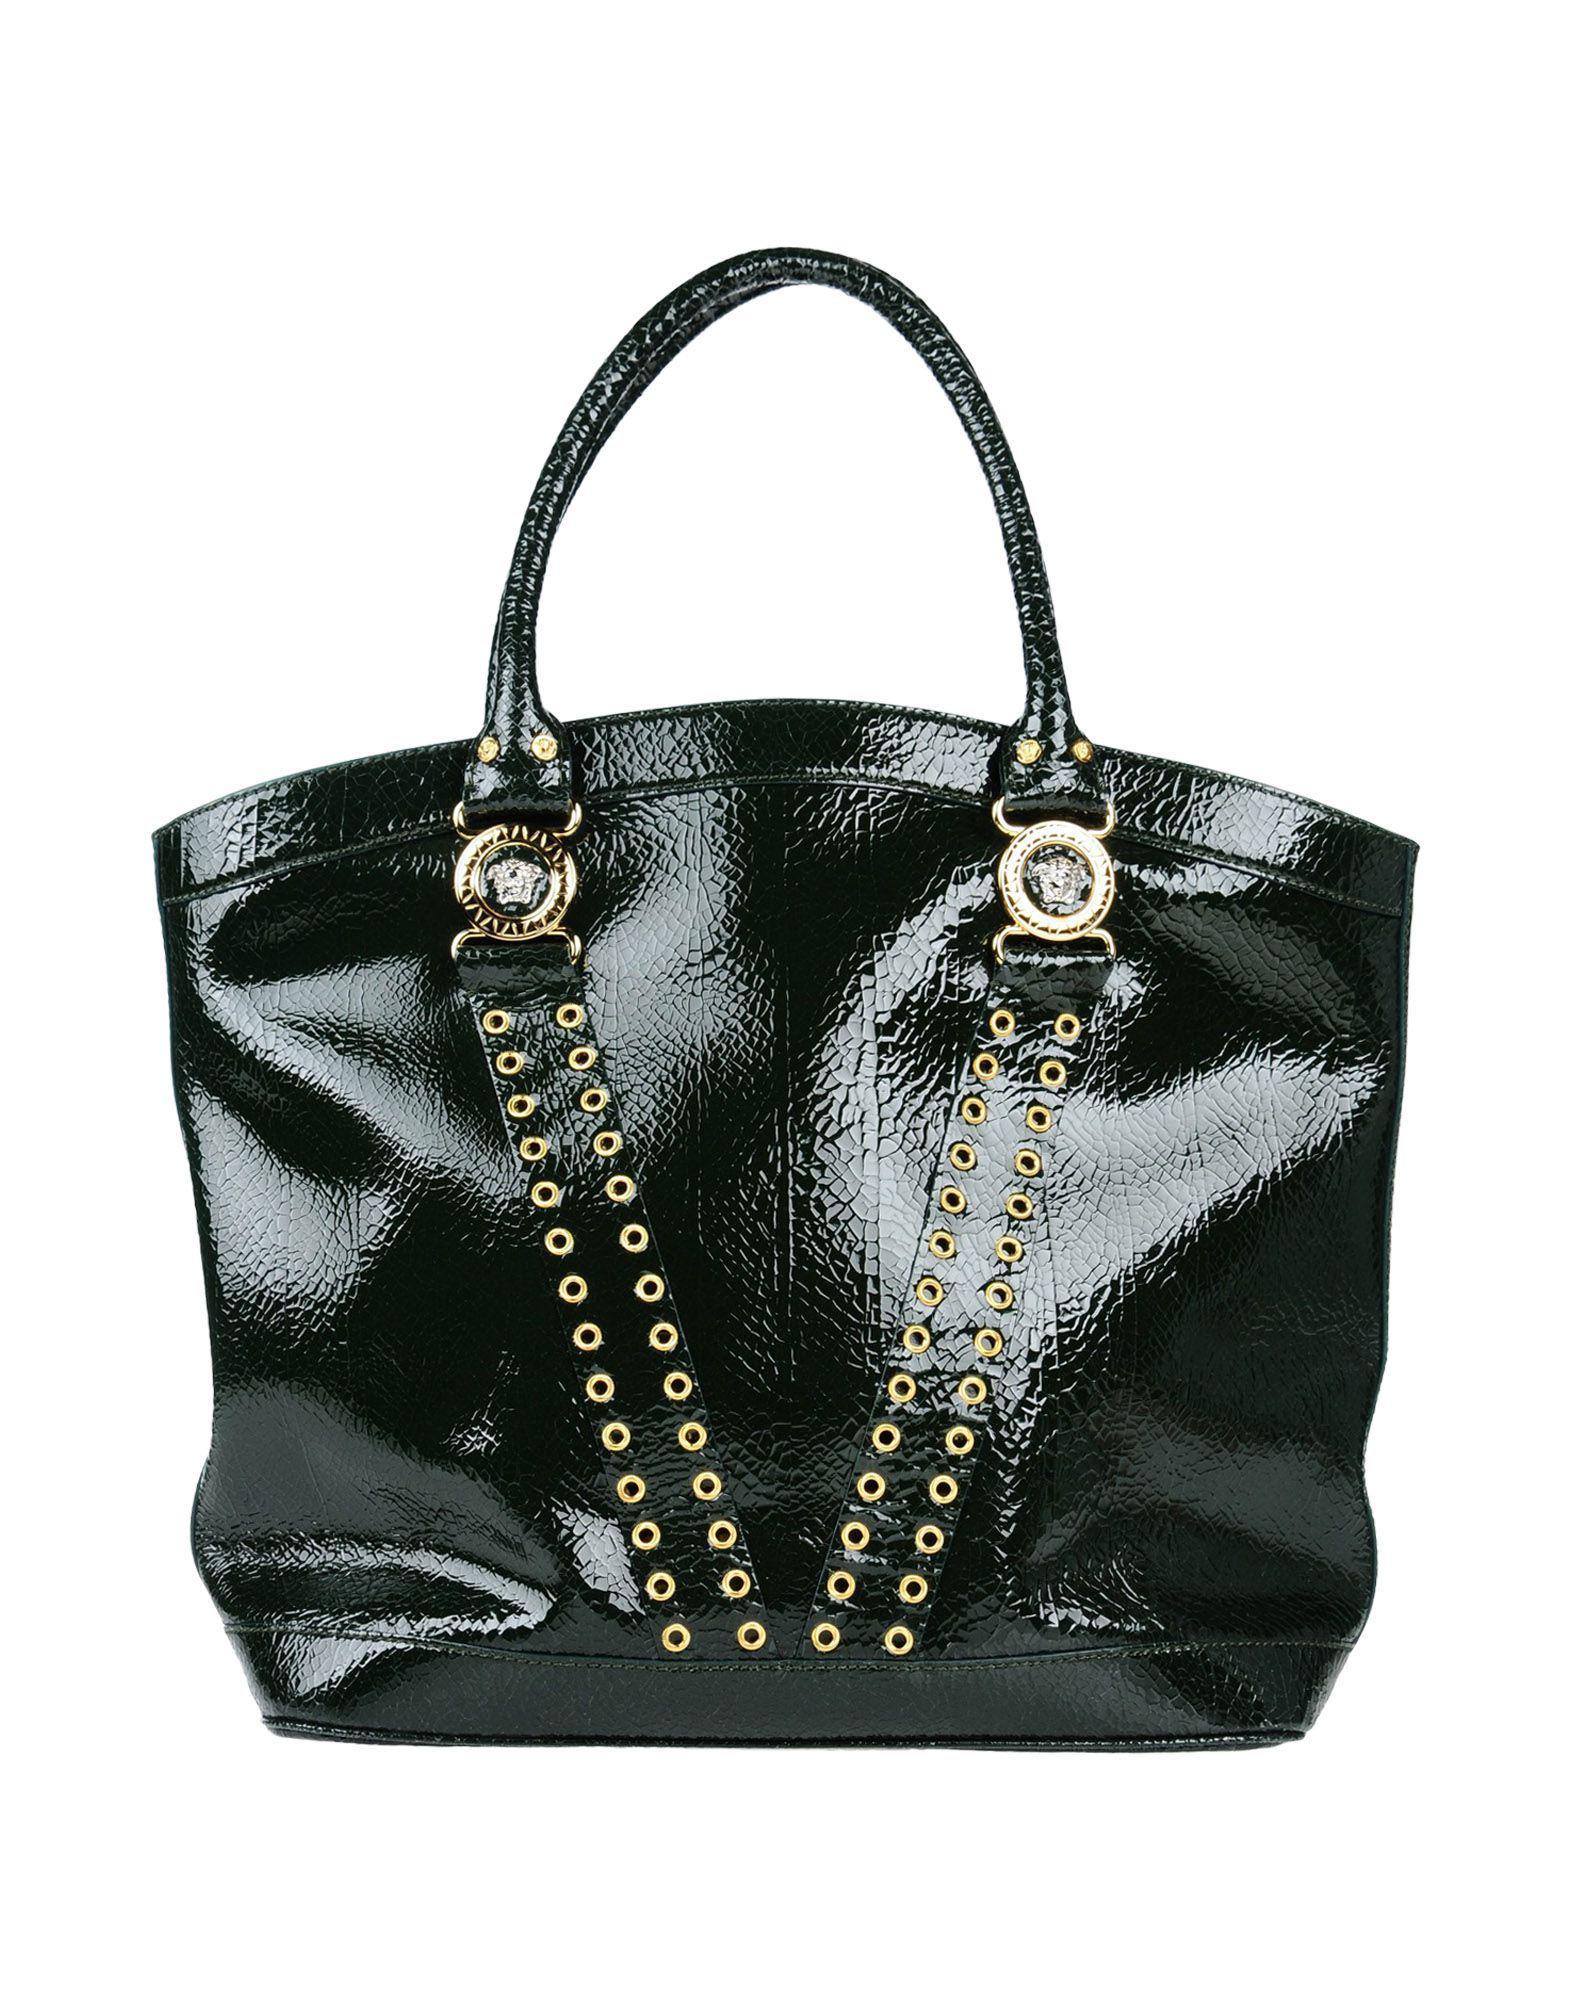 Lyst - Versace Handbags in Green 9a5143aee9